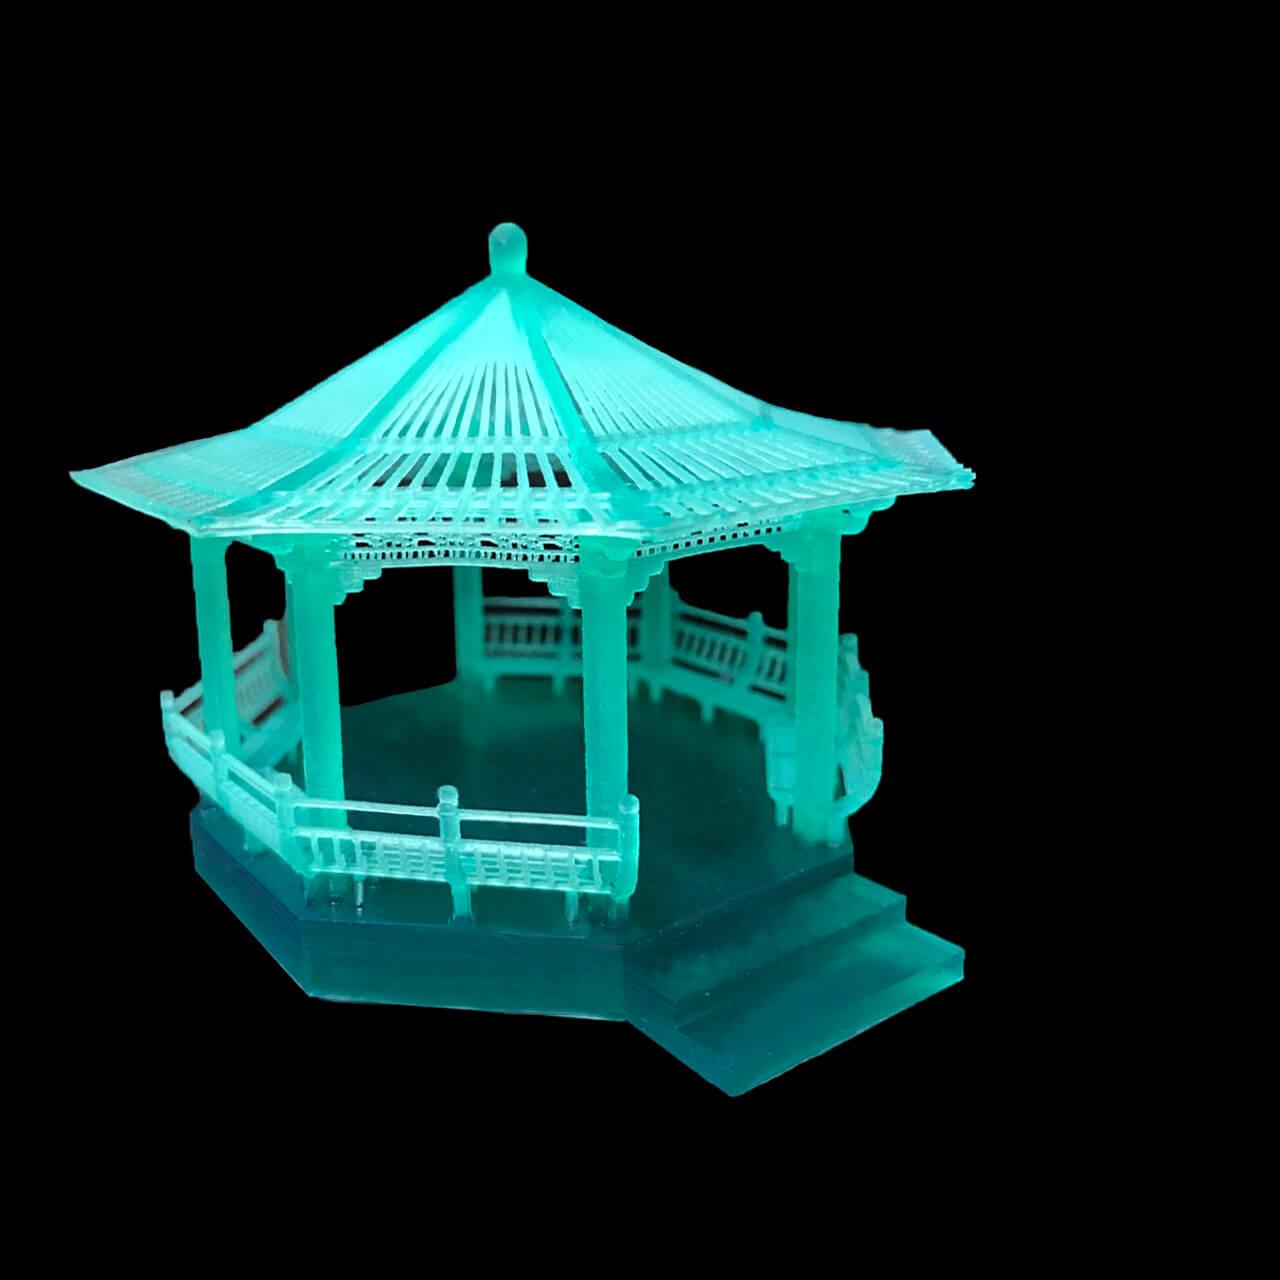 PrintsFunPlay Series3D Dream WorkshopSLA 3D PrinterDIY